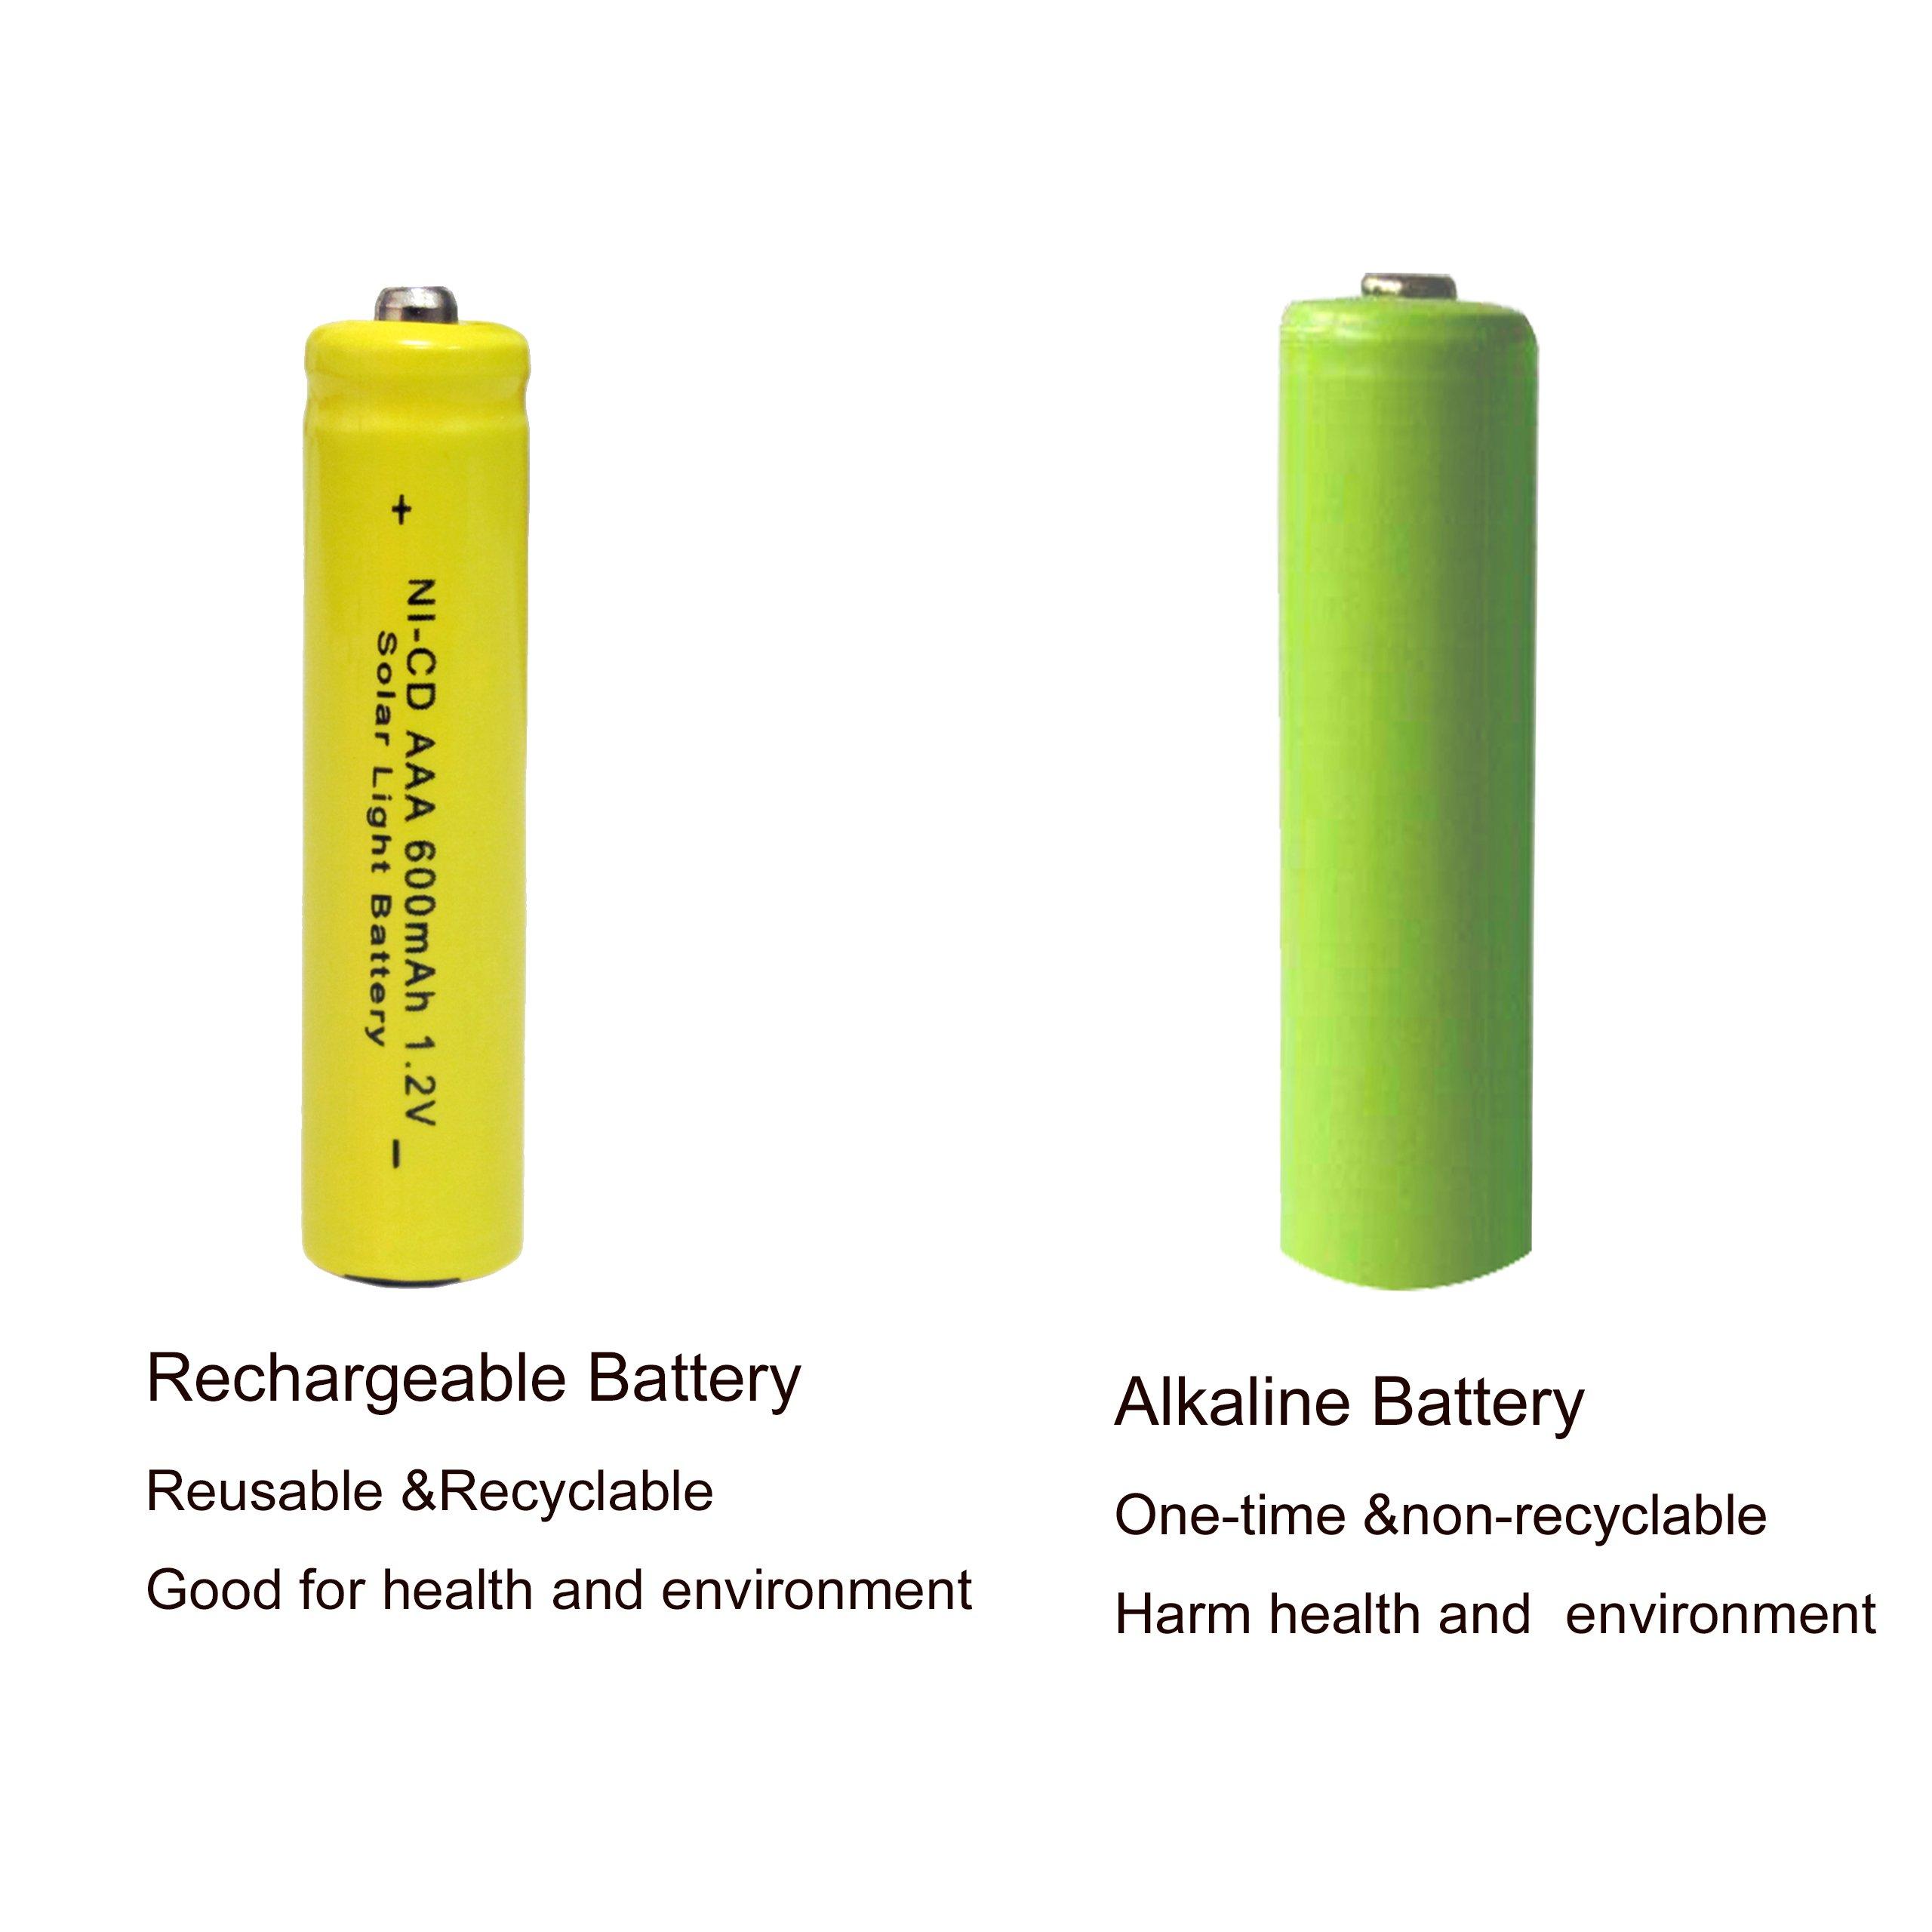 uk batteries owl p solar rechargeable smart ecolux ebay s aaa garden light